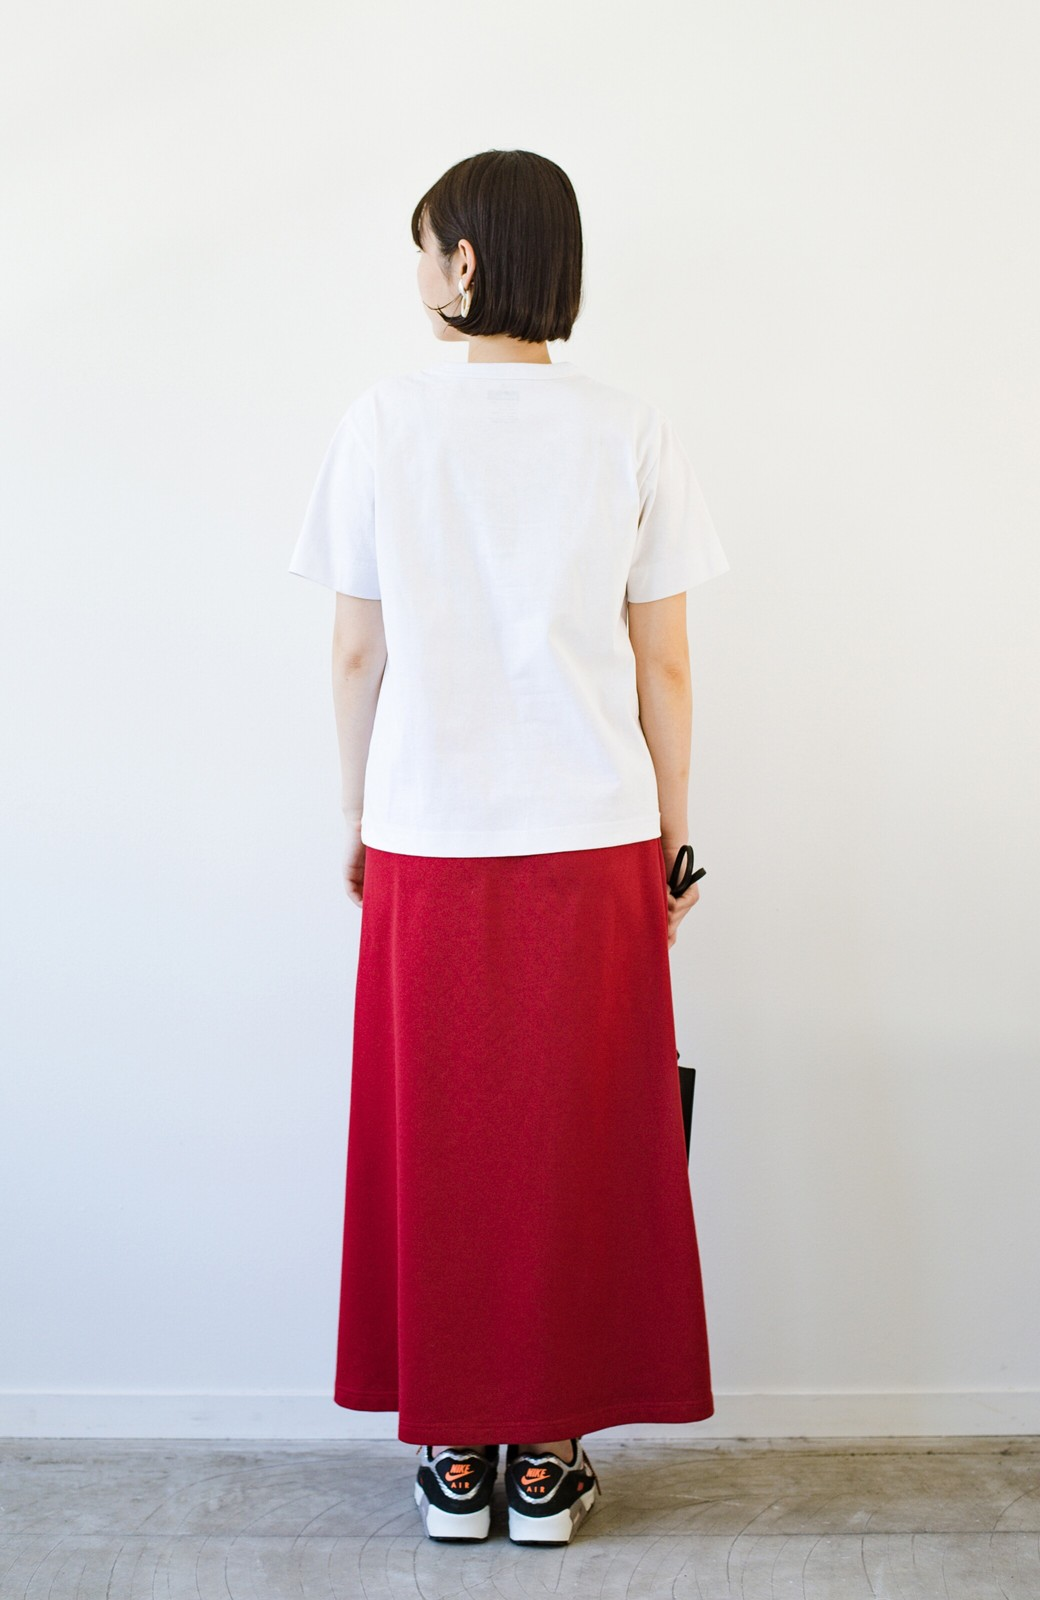 haco! さりげないロゴがコーデのポイントになるファンクションファブリックジャージークルーネックTシャツ by Healthknit <ホワイト>の商品写真10